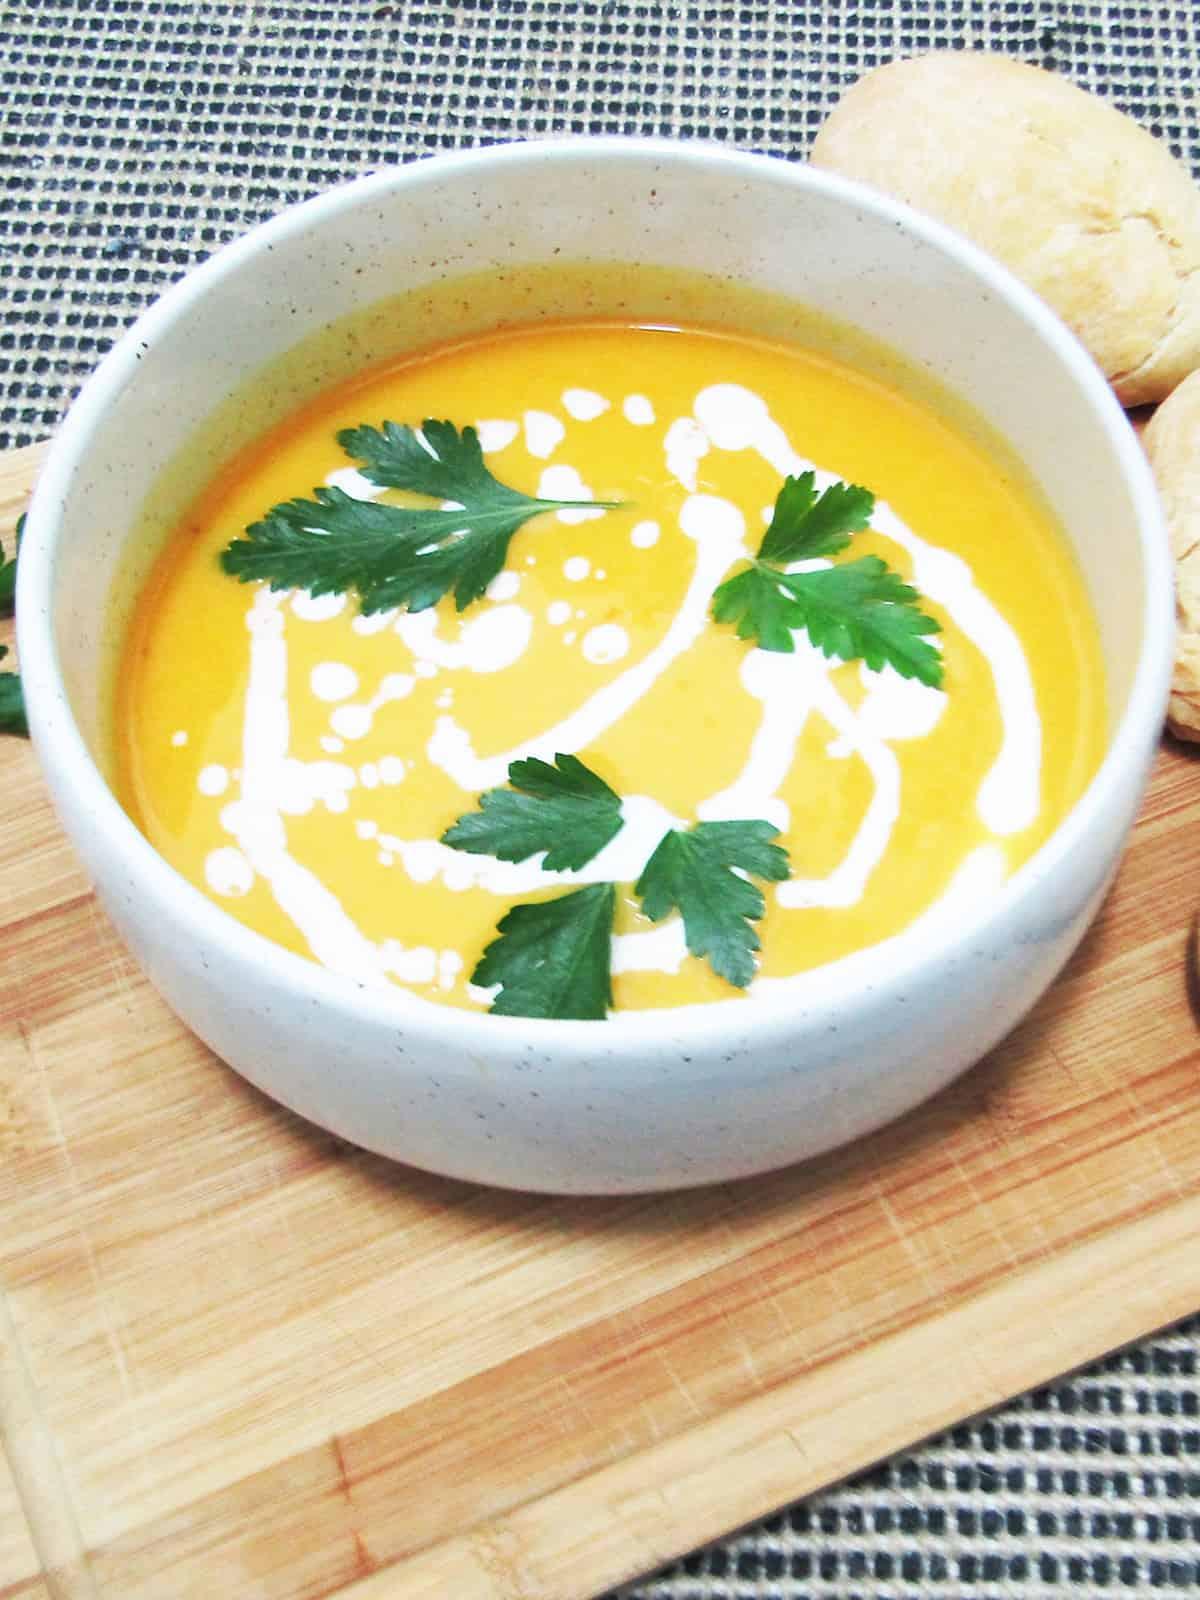 Vegan pumpkin soup in a bowl